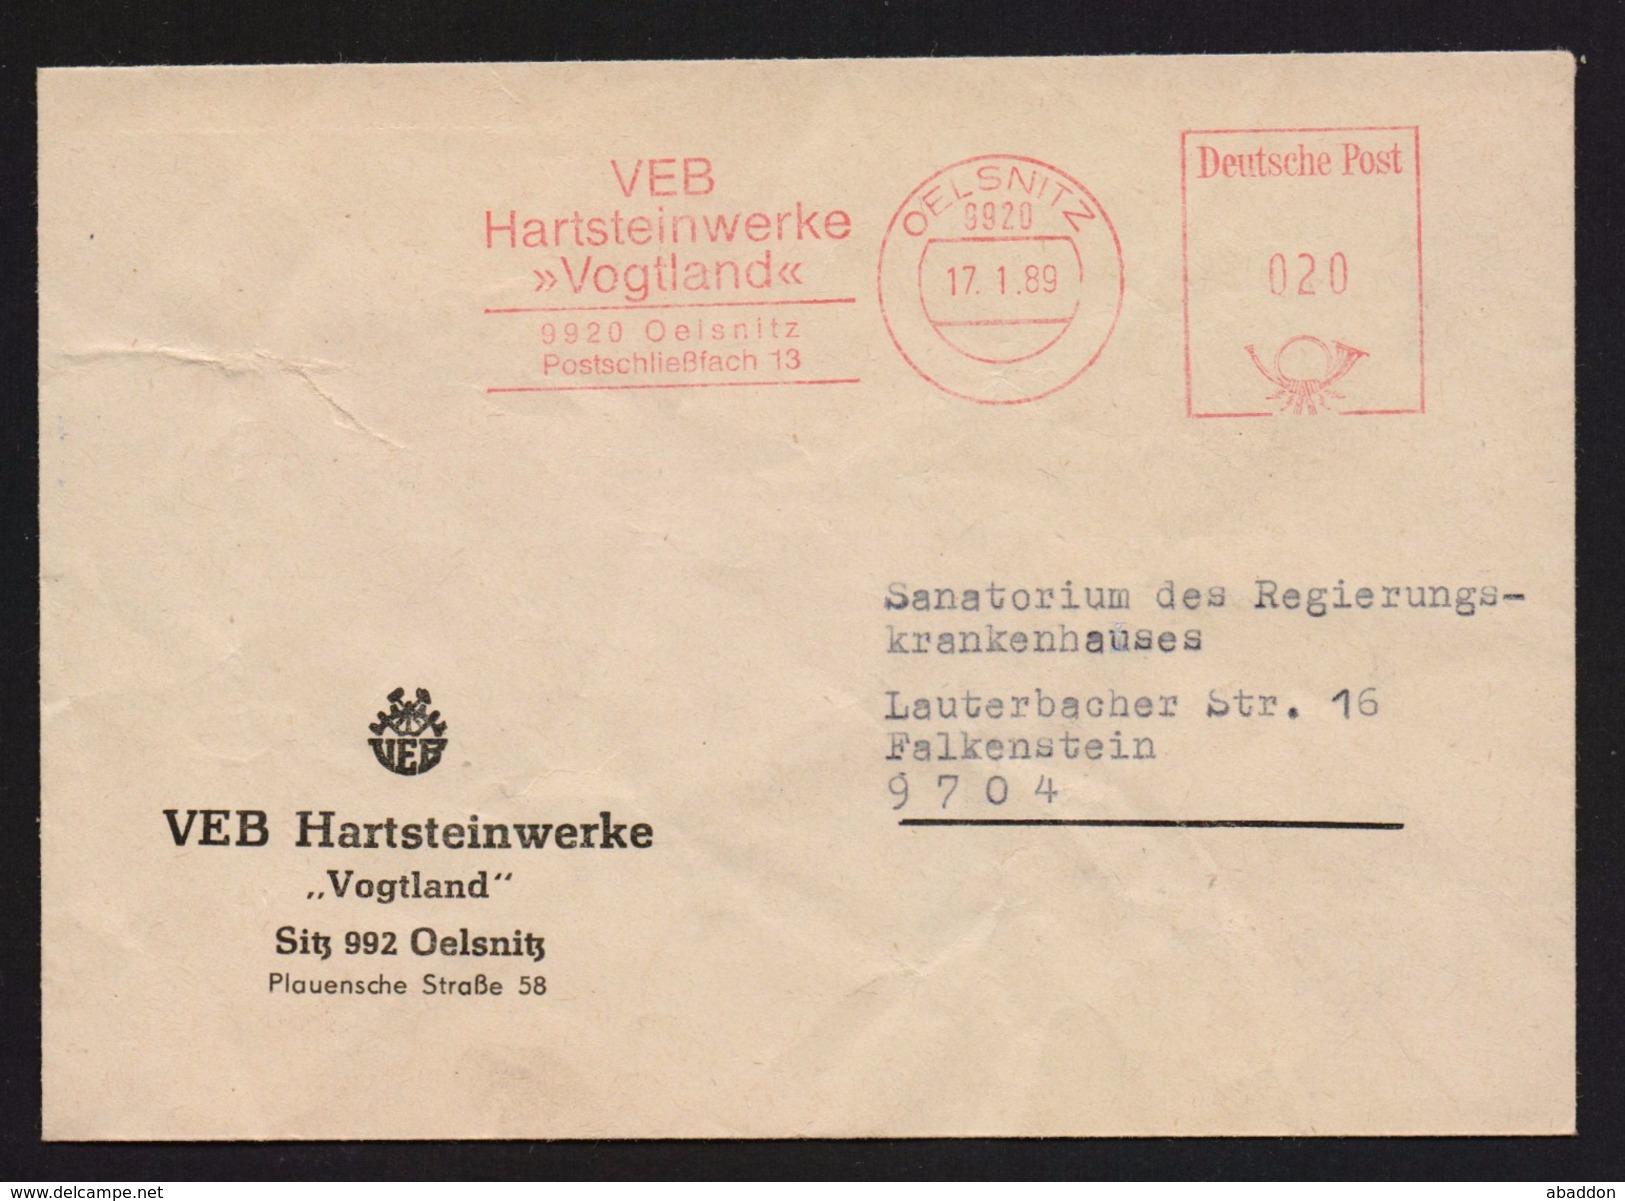 "DDR AFS - VEB Hartsteinwerke ""Vogtland"", OELSNITZ 17.1.89 (88) - Poststempel - Freistempel"